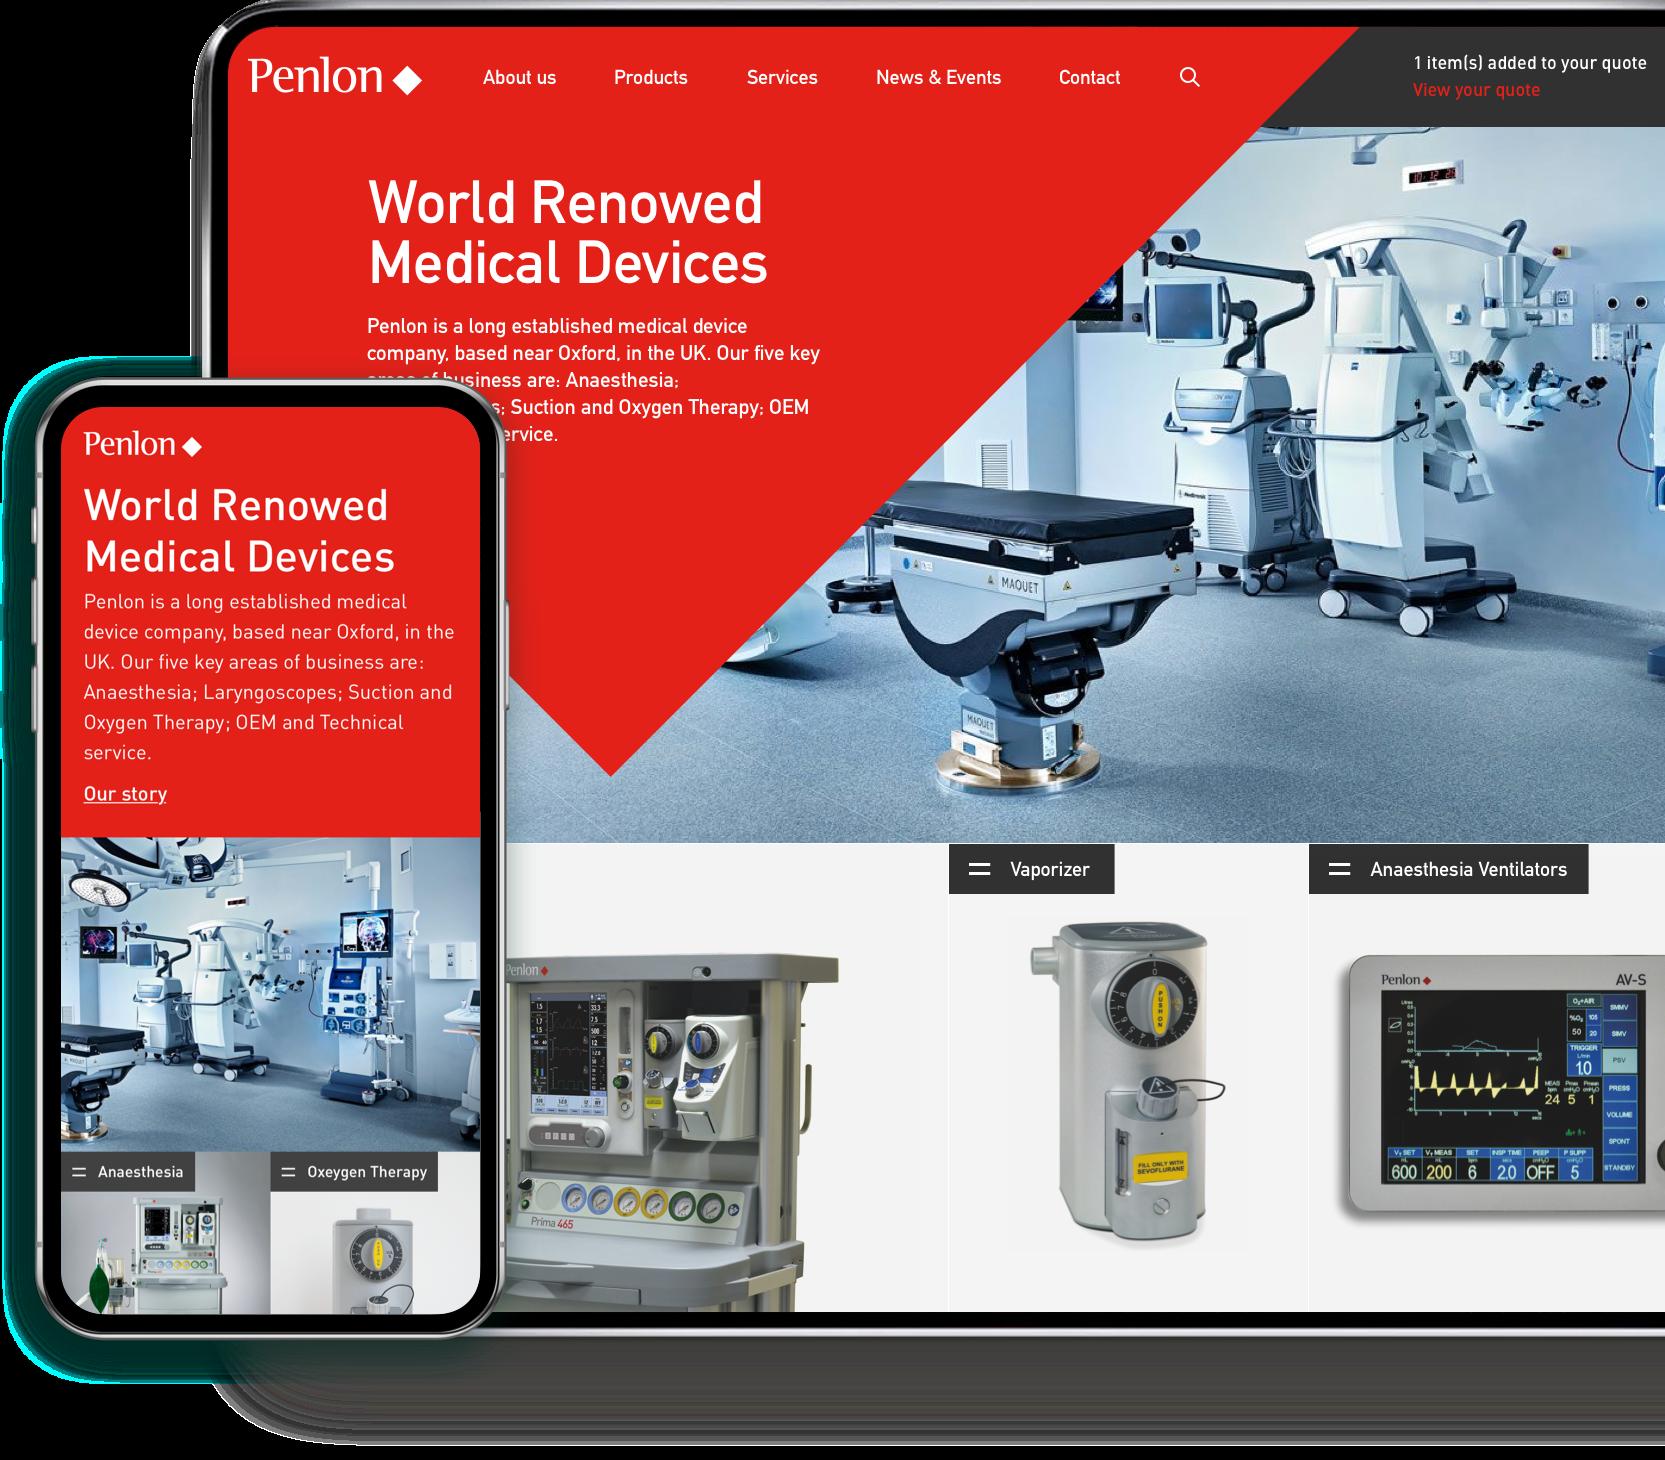 Penlon desktop and mobile website design